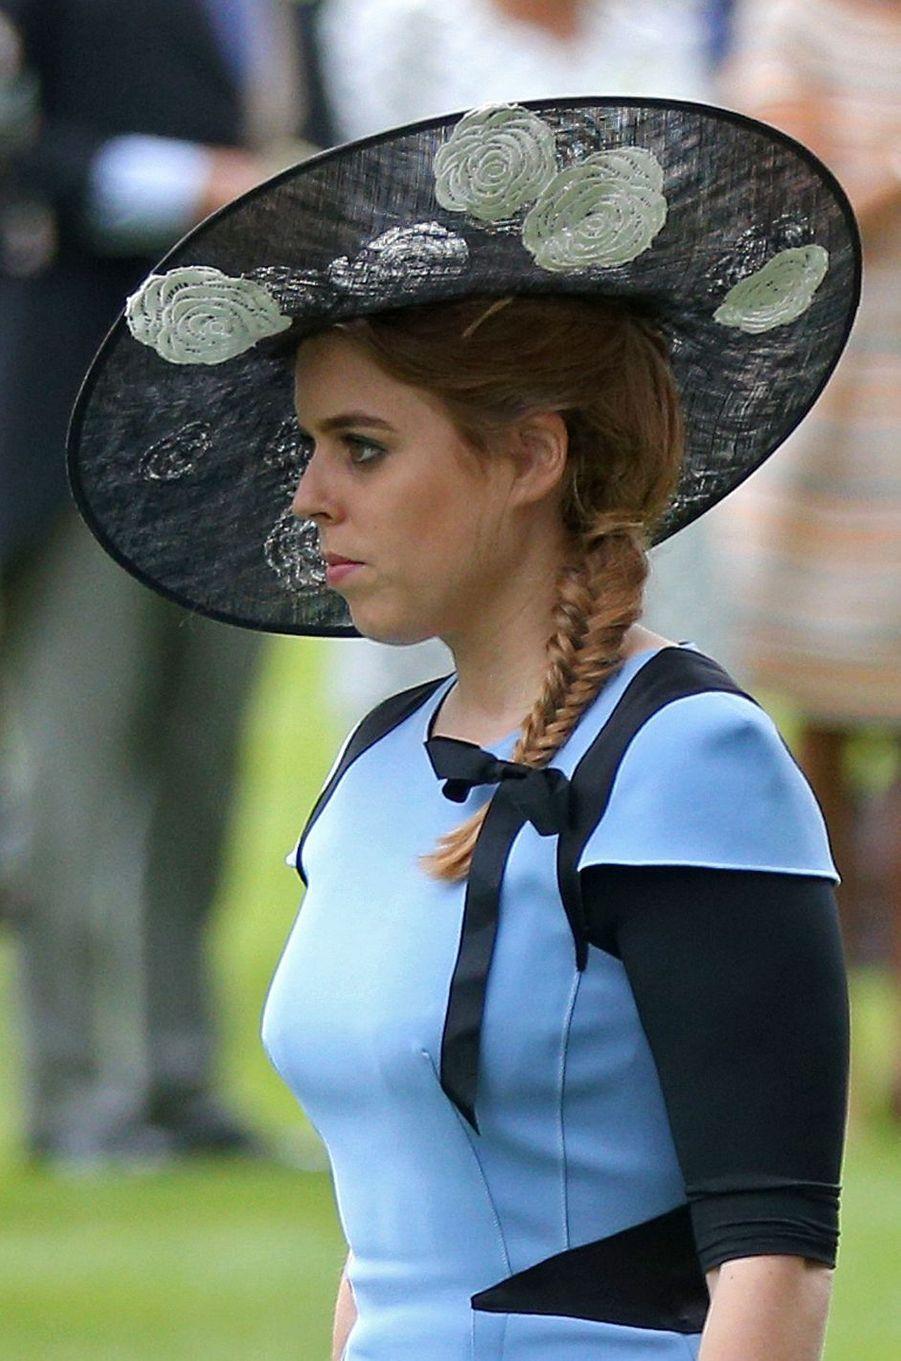 La princesse Beatrice d'York, le 22 juin 2017